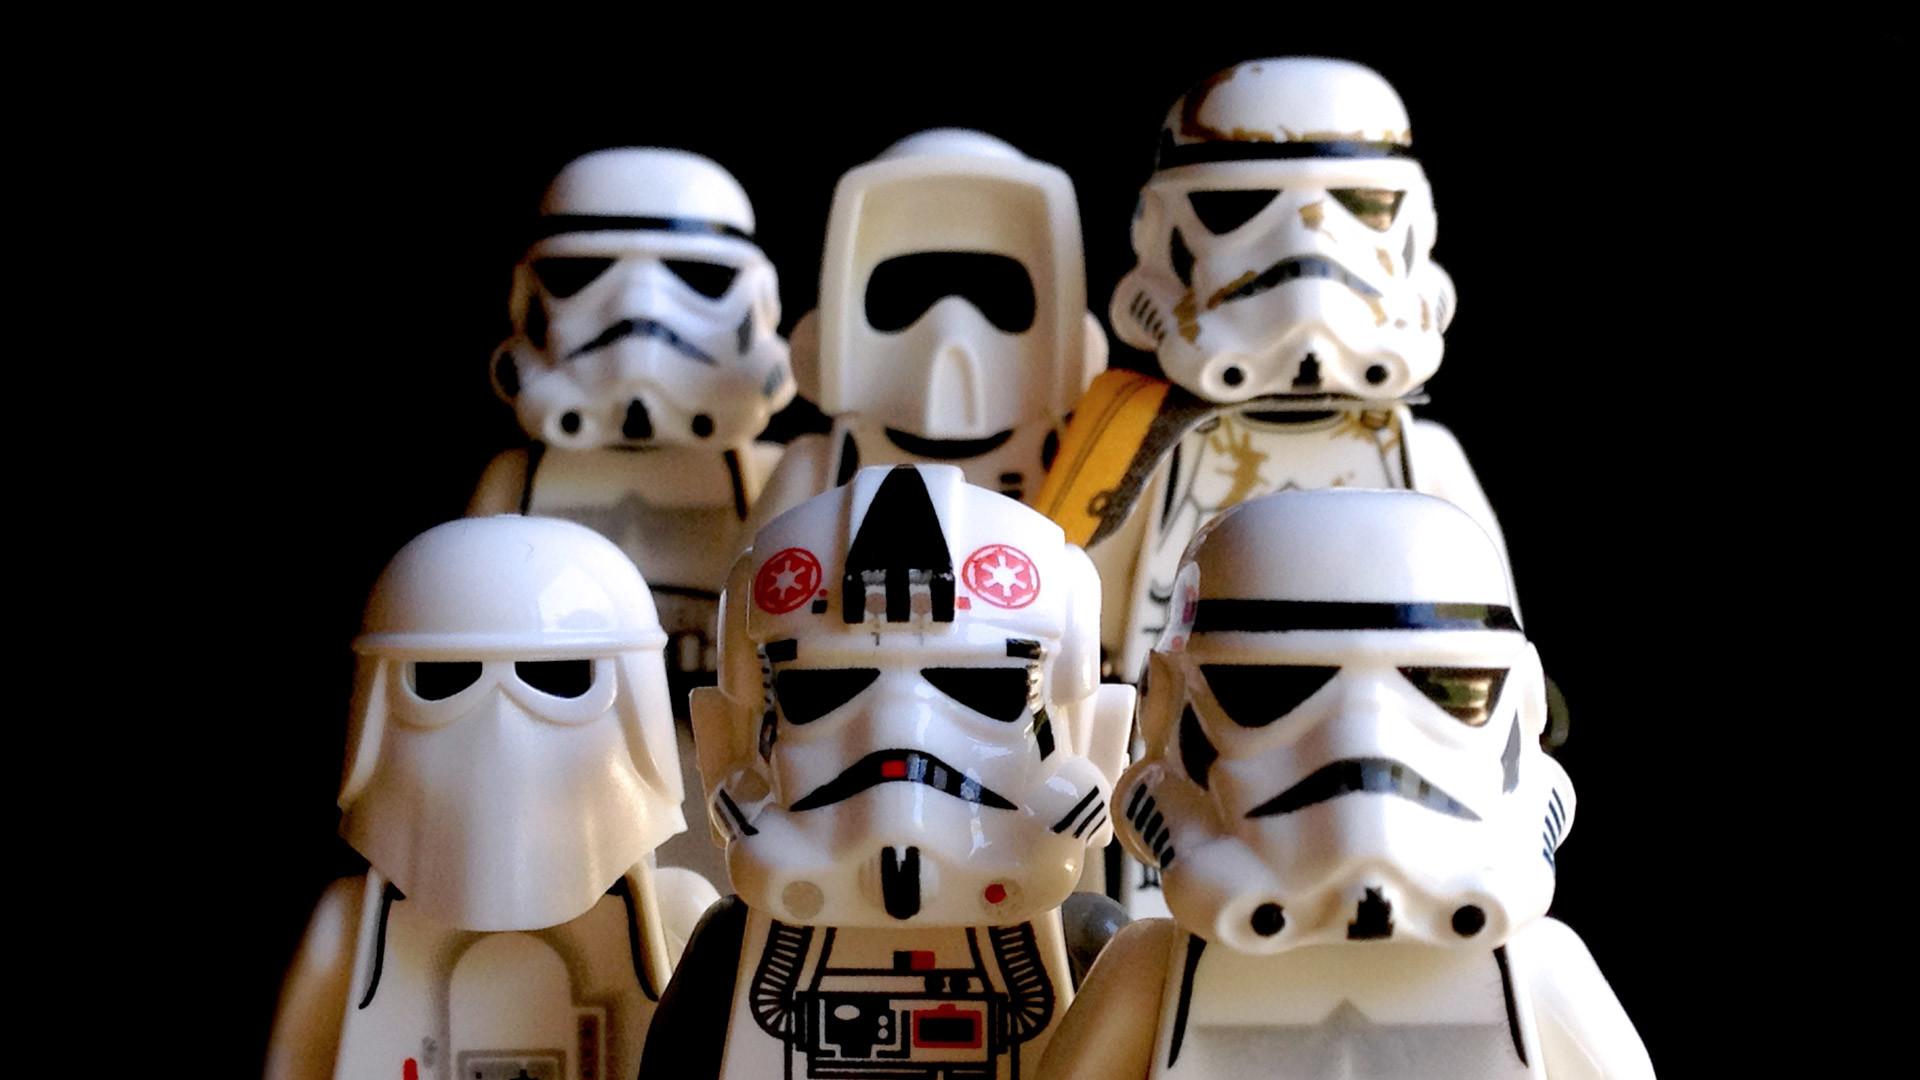 stormtrooper lego desktop wallpapers – Google Search